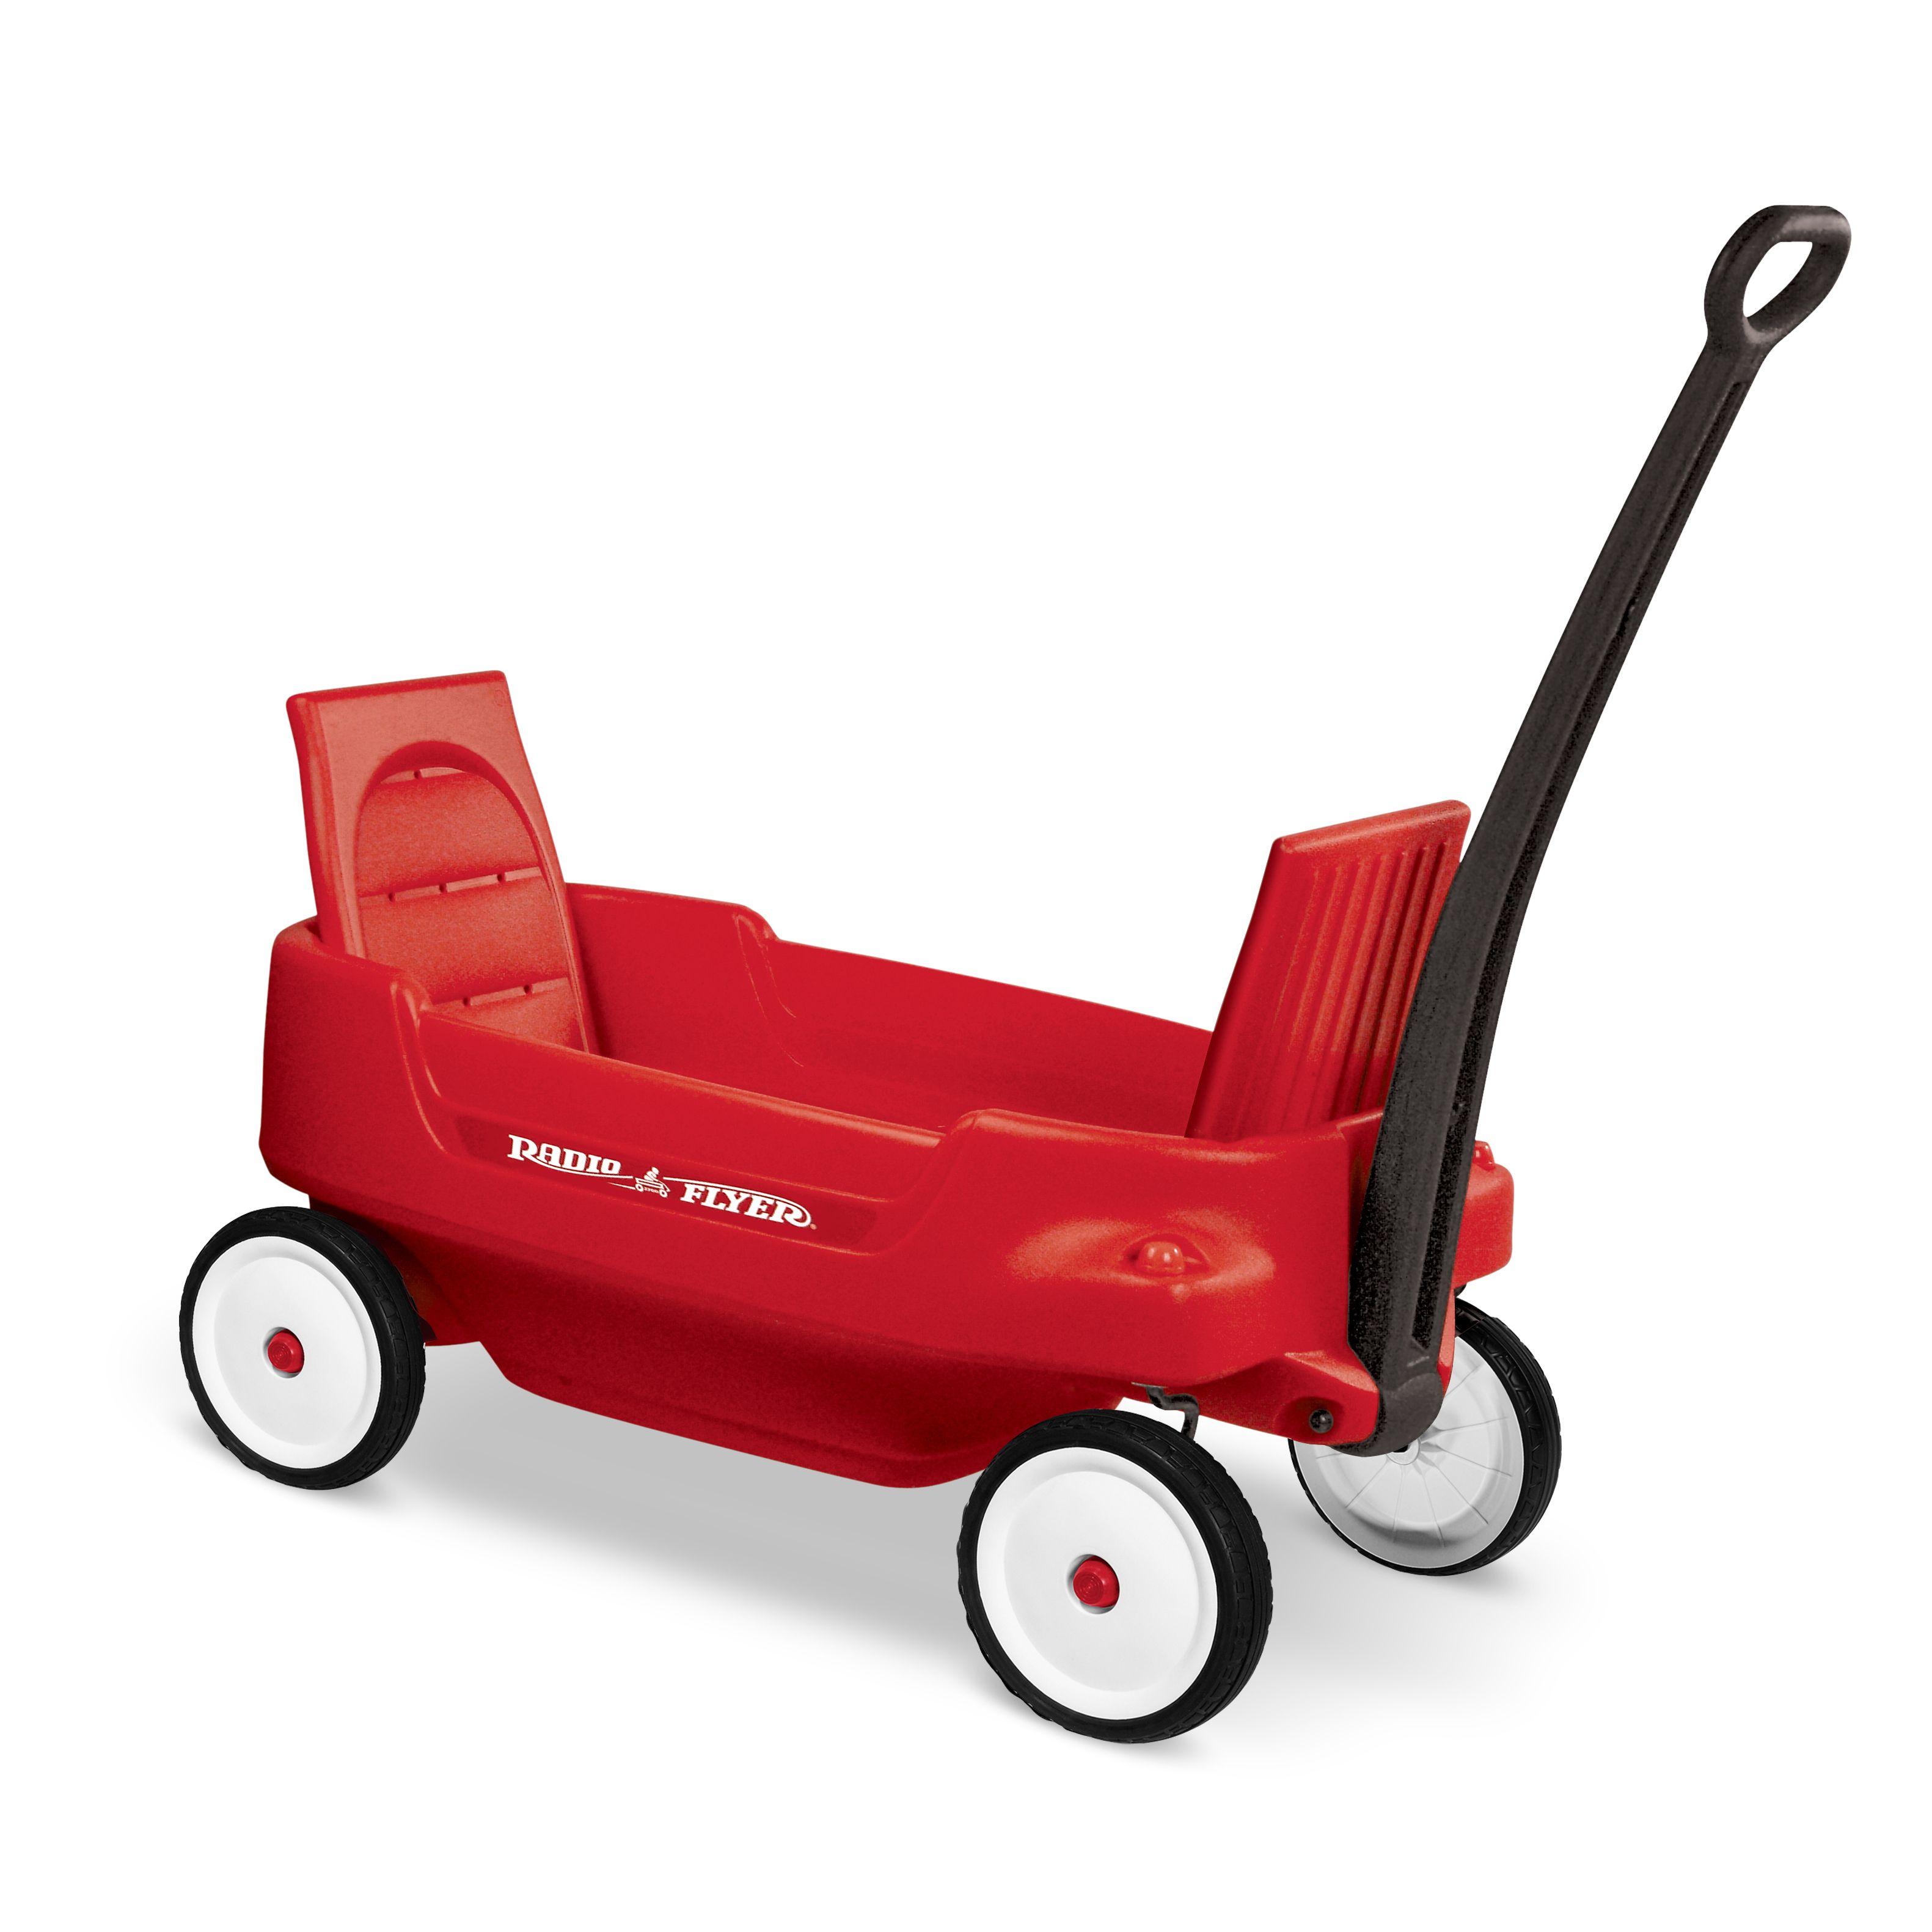 Pathfinder Wagon® Radio flyer, Children, Folded up